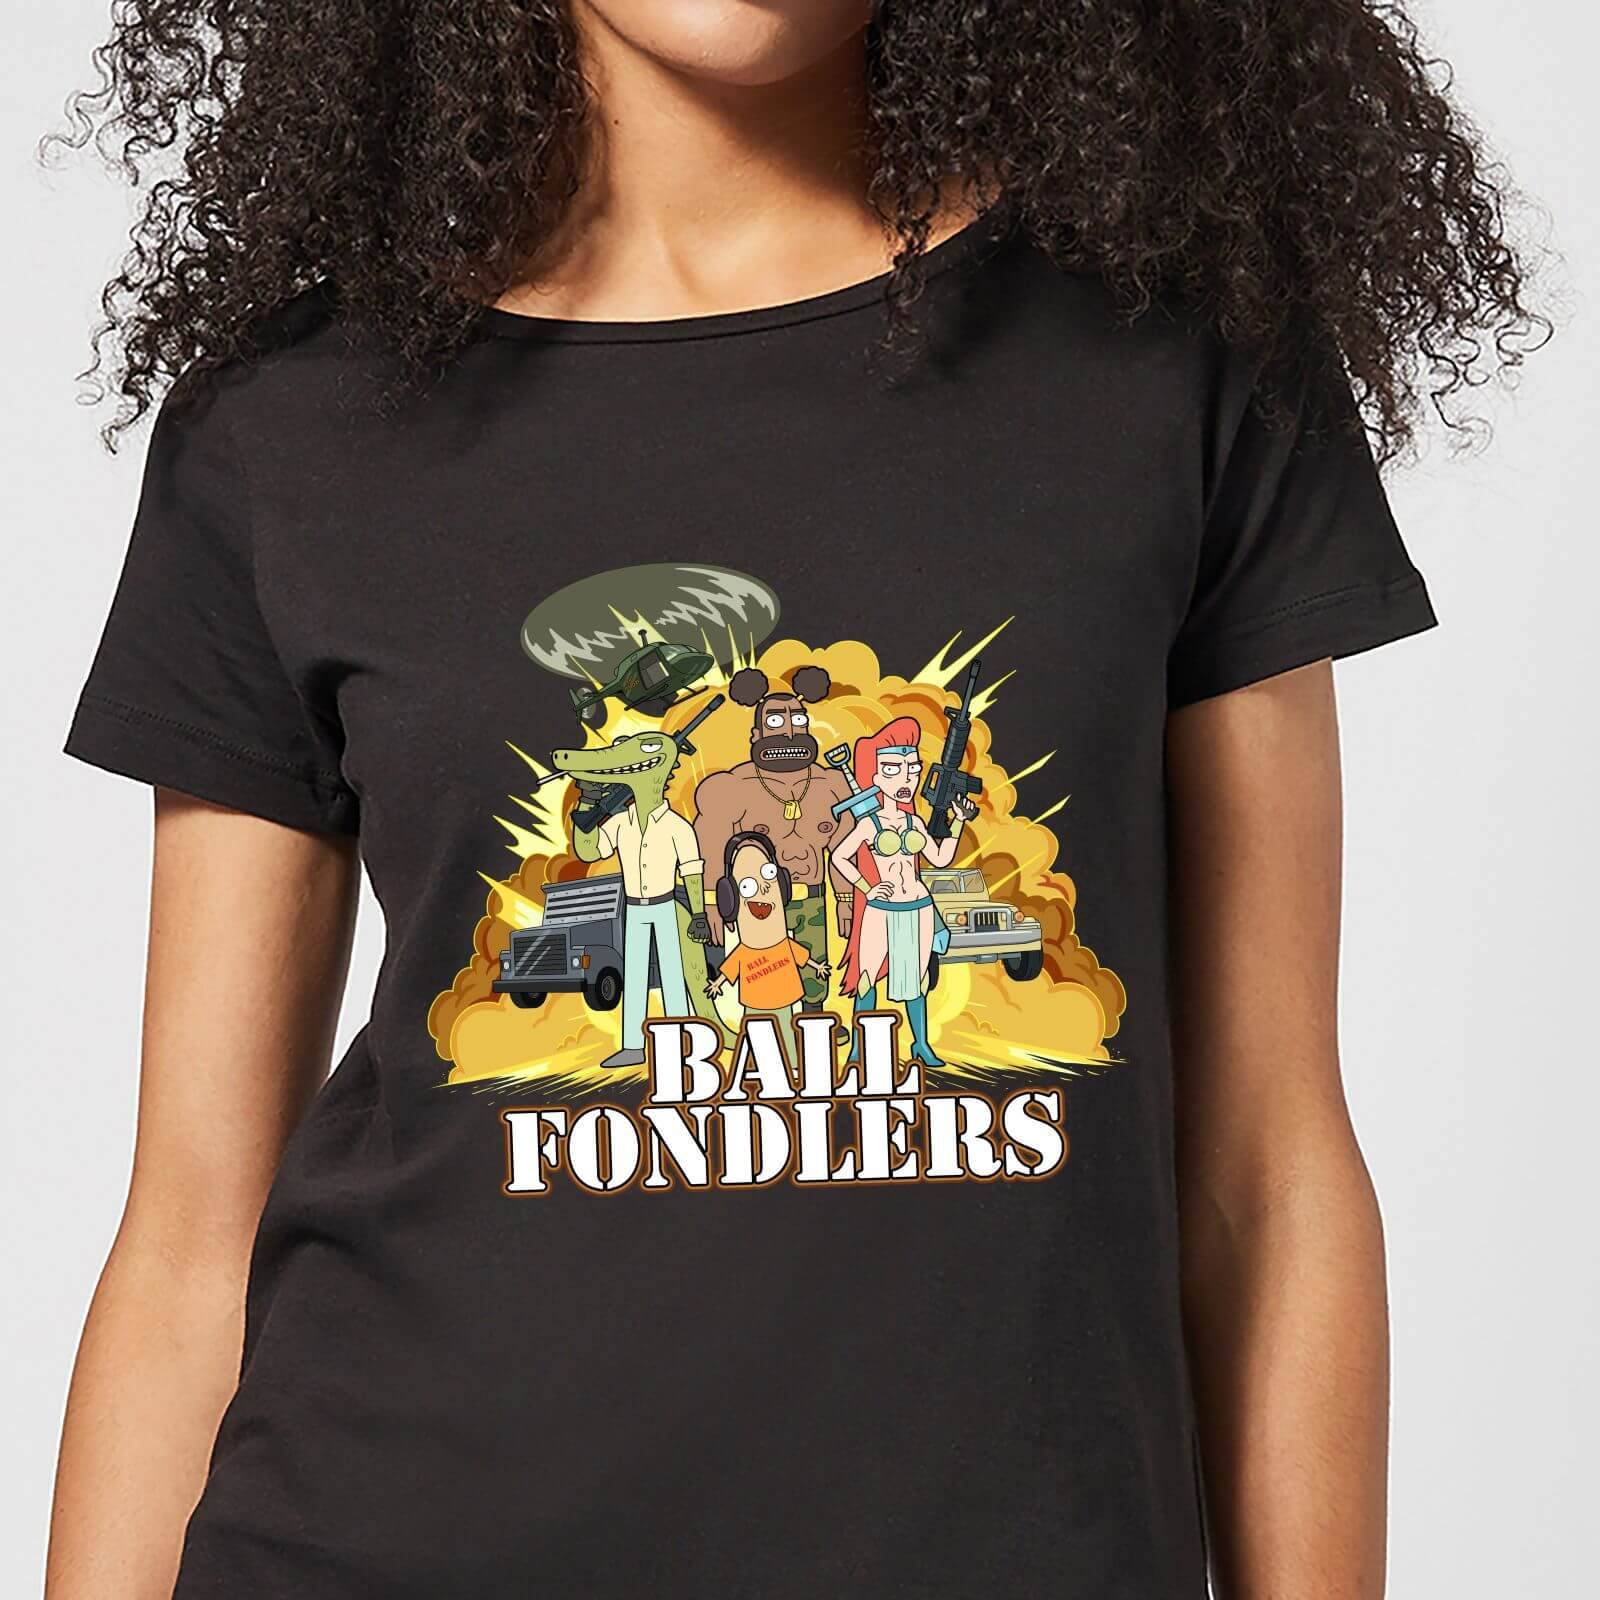 Rick and Morty Ball Fondlers Women's T-Shirt - Black - S - Black